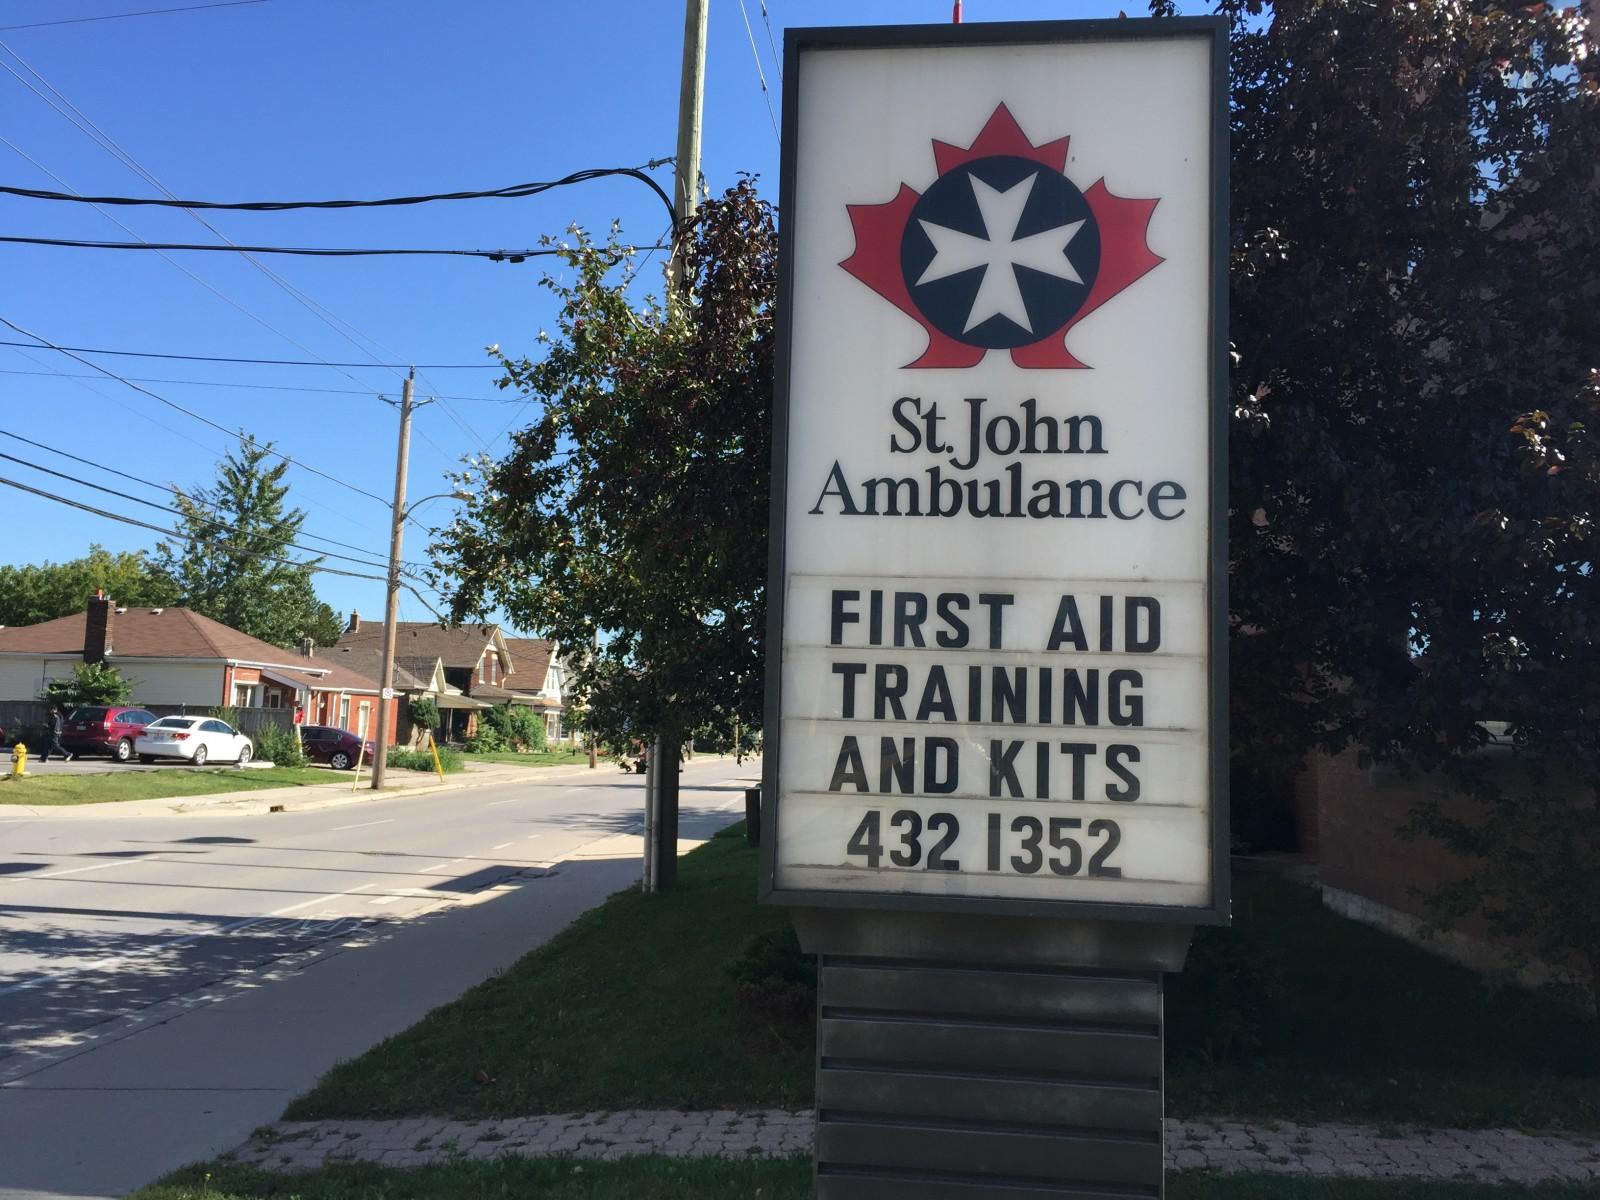 St. John's Ambulance pet first aid training